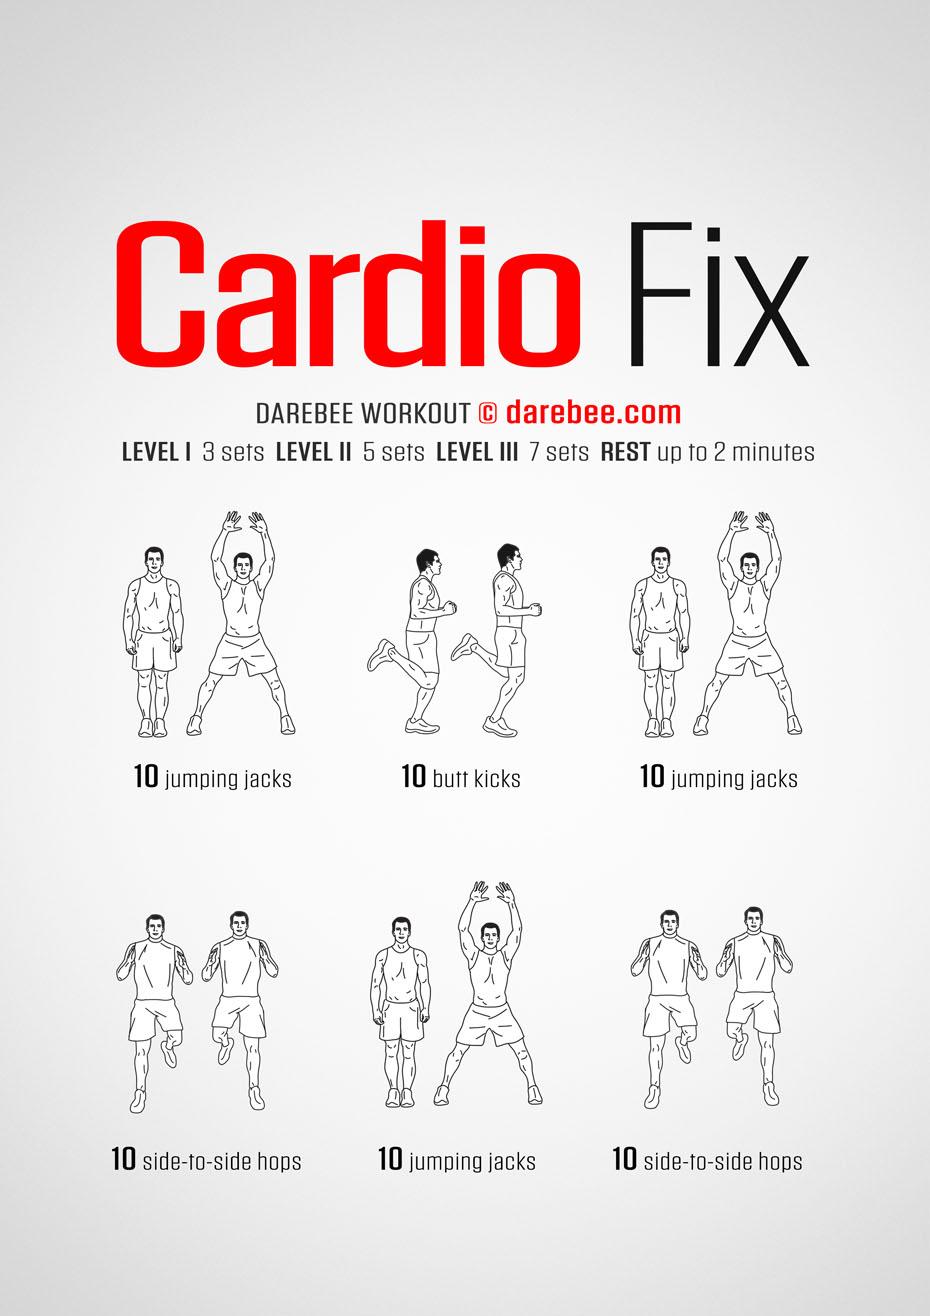 cardio fix workout